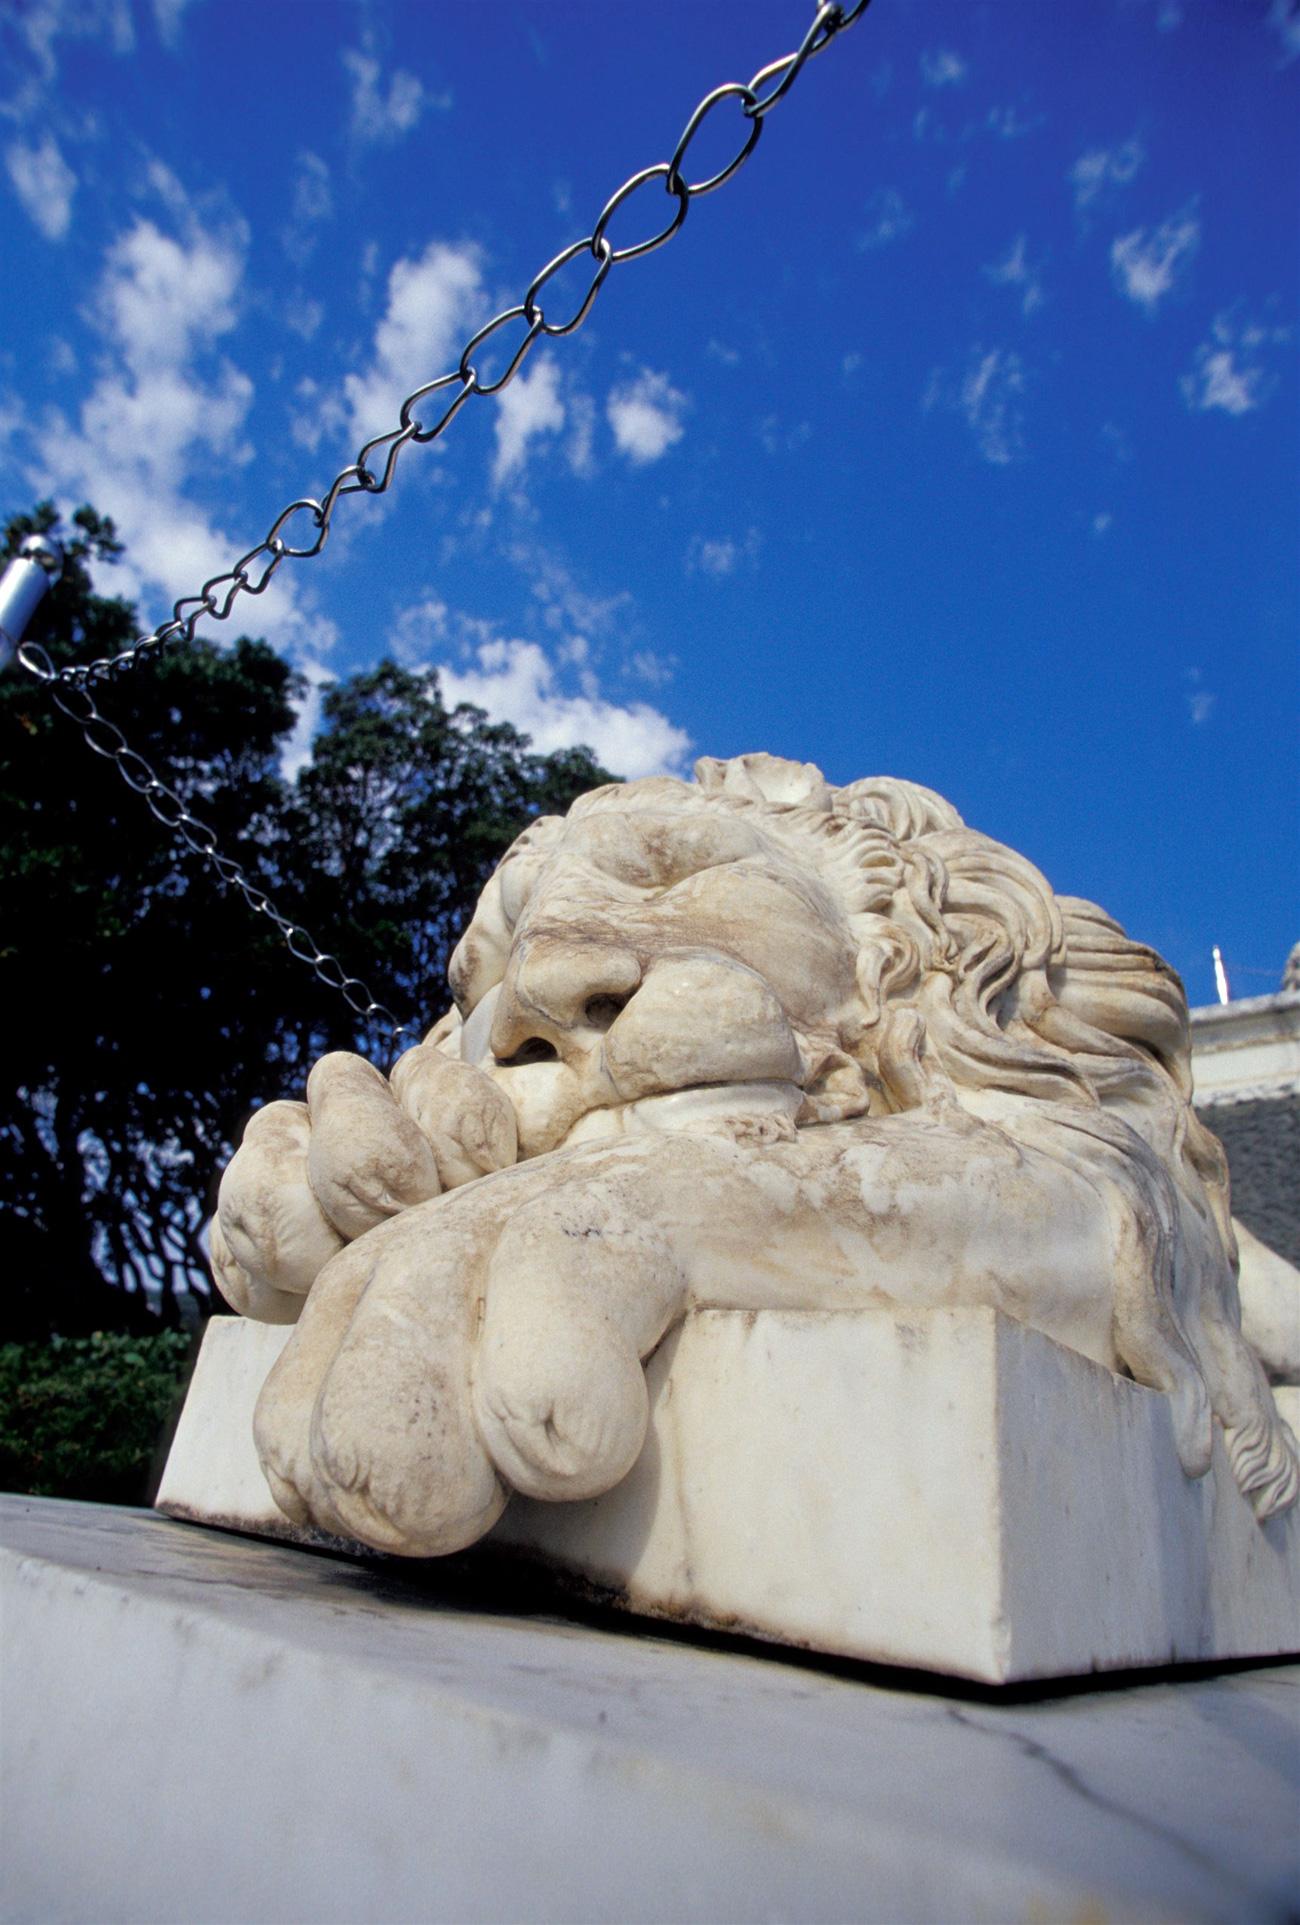 Sleeping lion stone statue. Source: Danita Delimont/Global Look Press